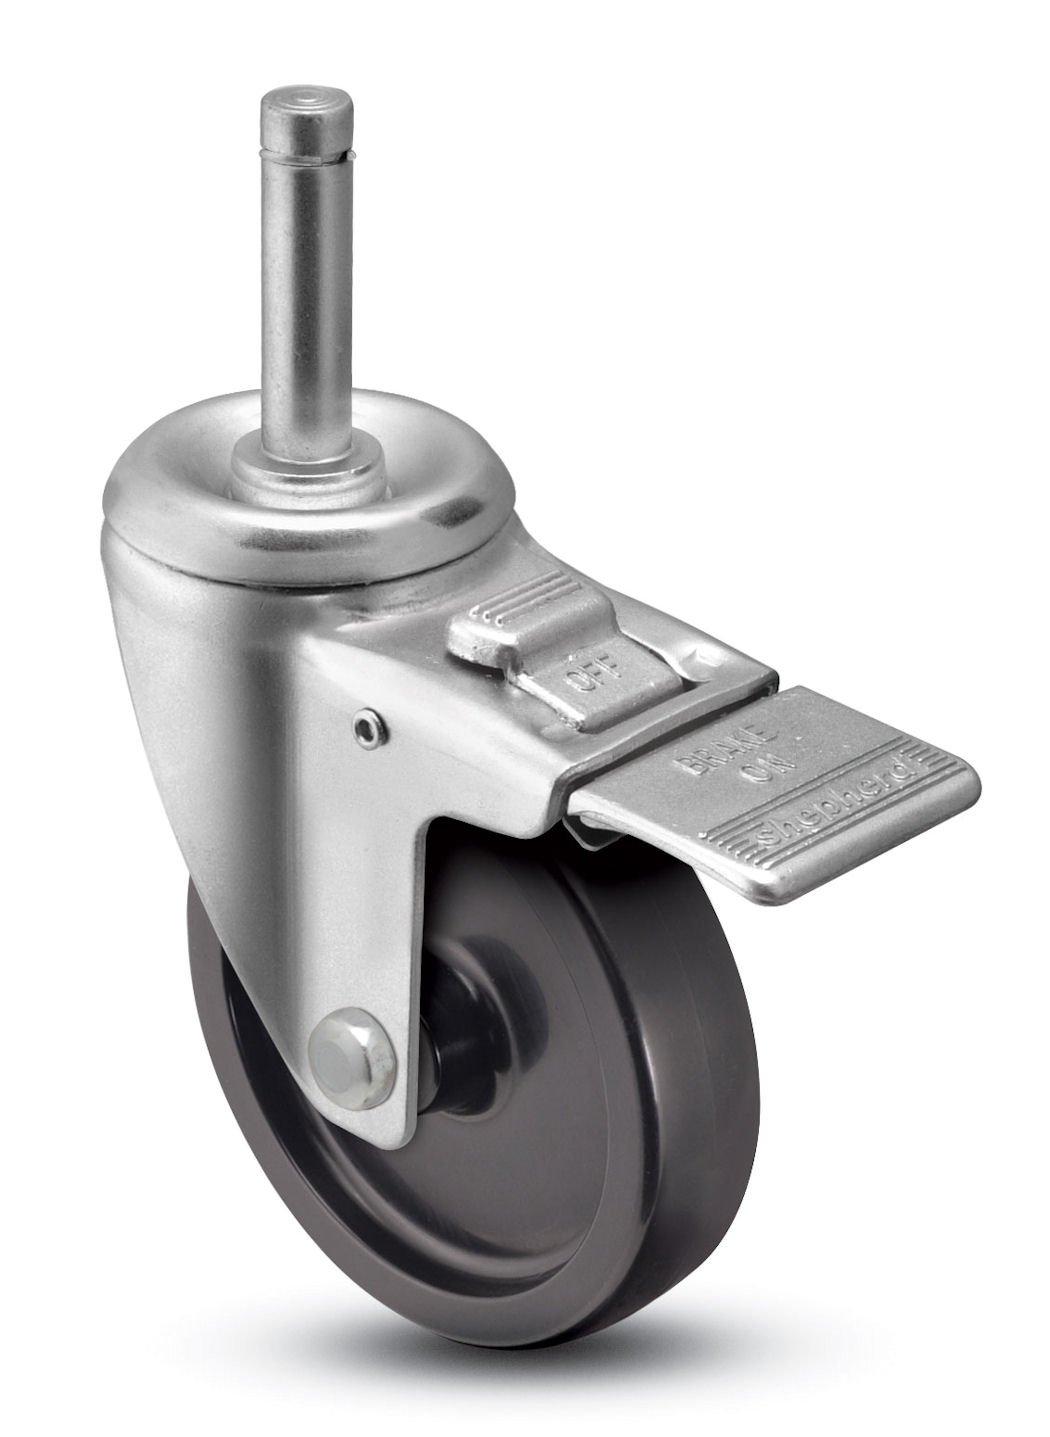 Shepherd Institutional Series 3 Diameter Polyolefin Wheel Total Lock Caster 7//16 Diameter x 1-7//16 Length Brass Band Grip Ring Stem 250 lbs Capacity